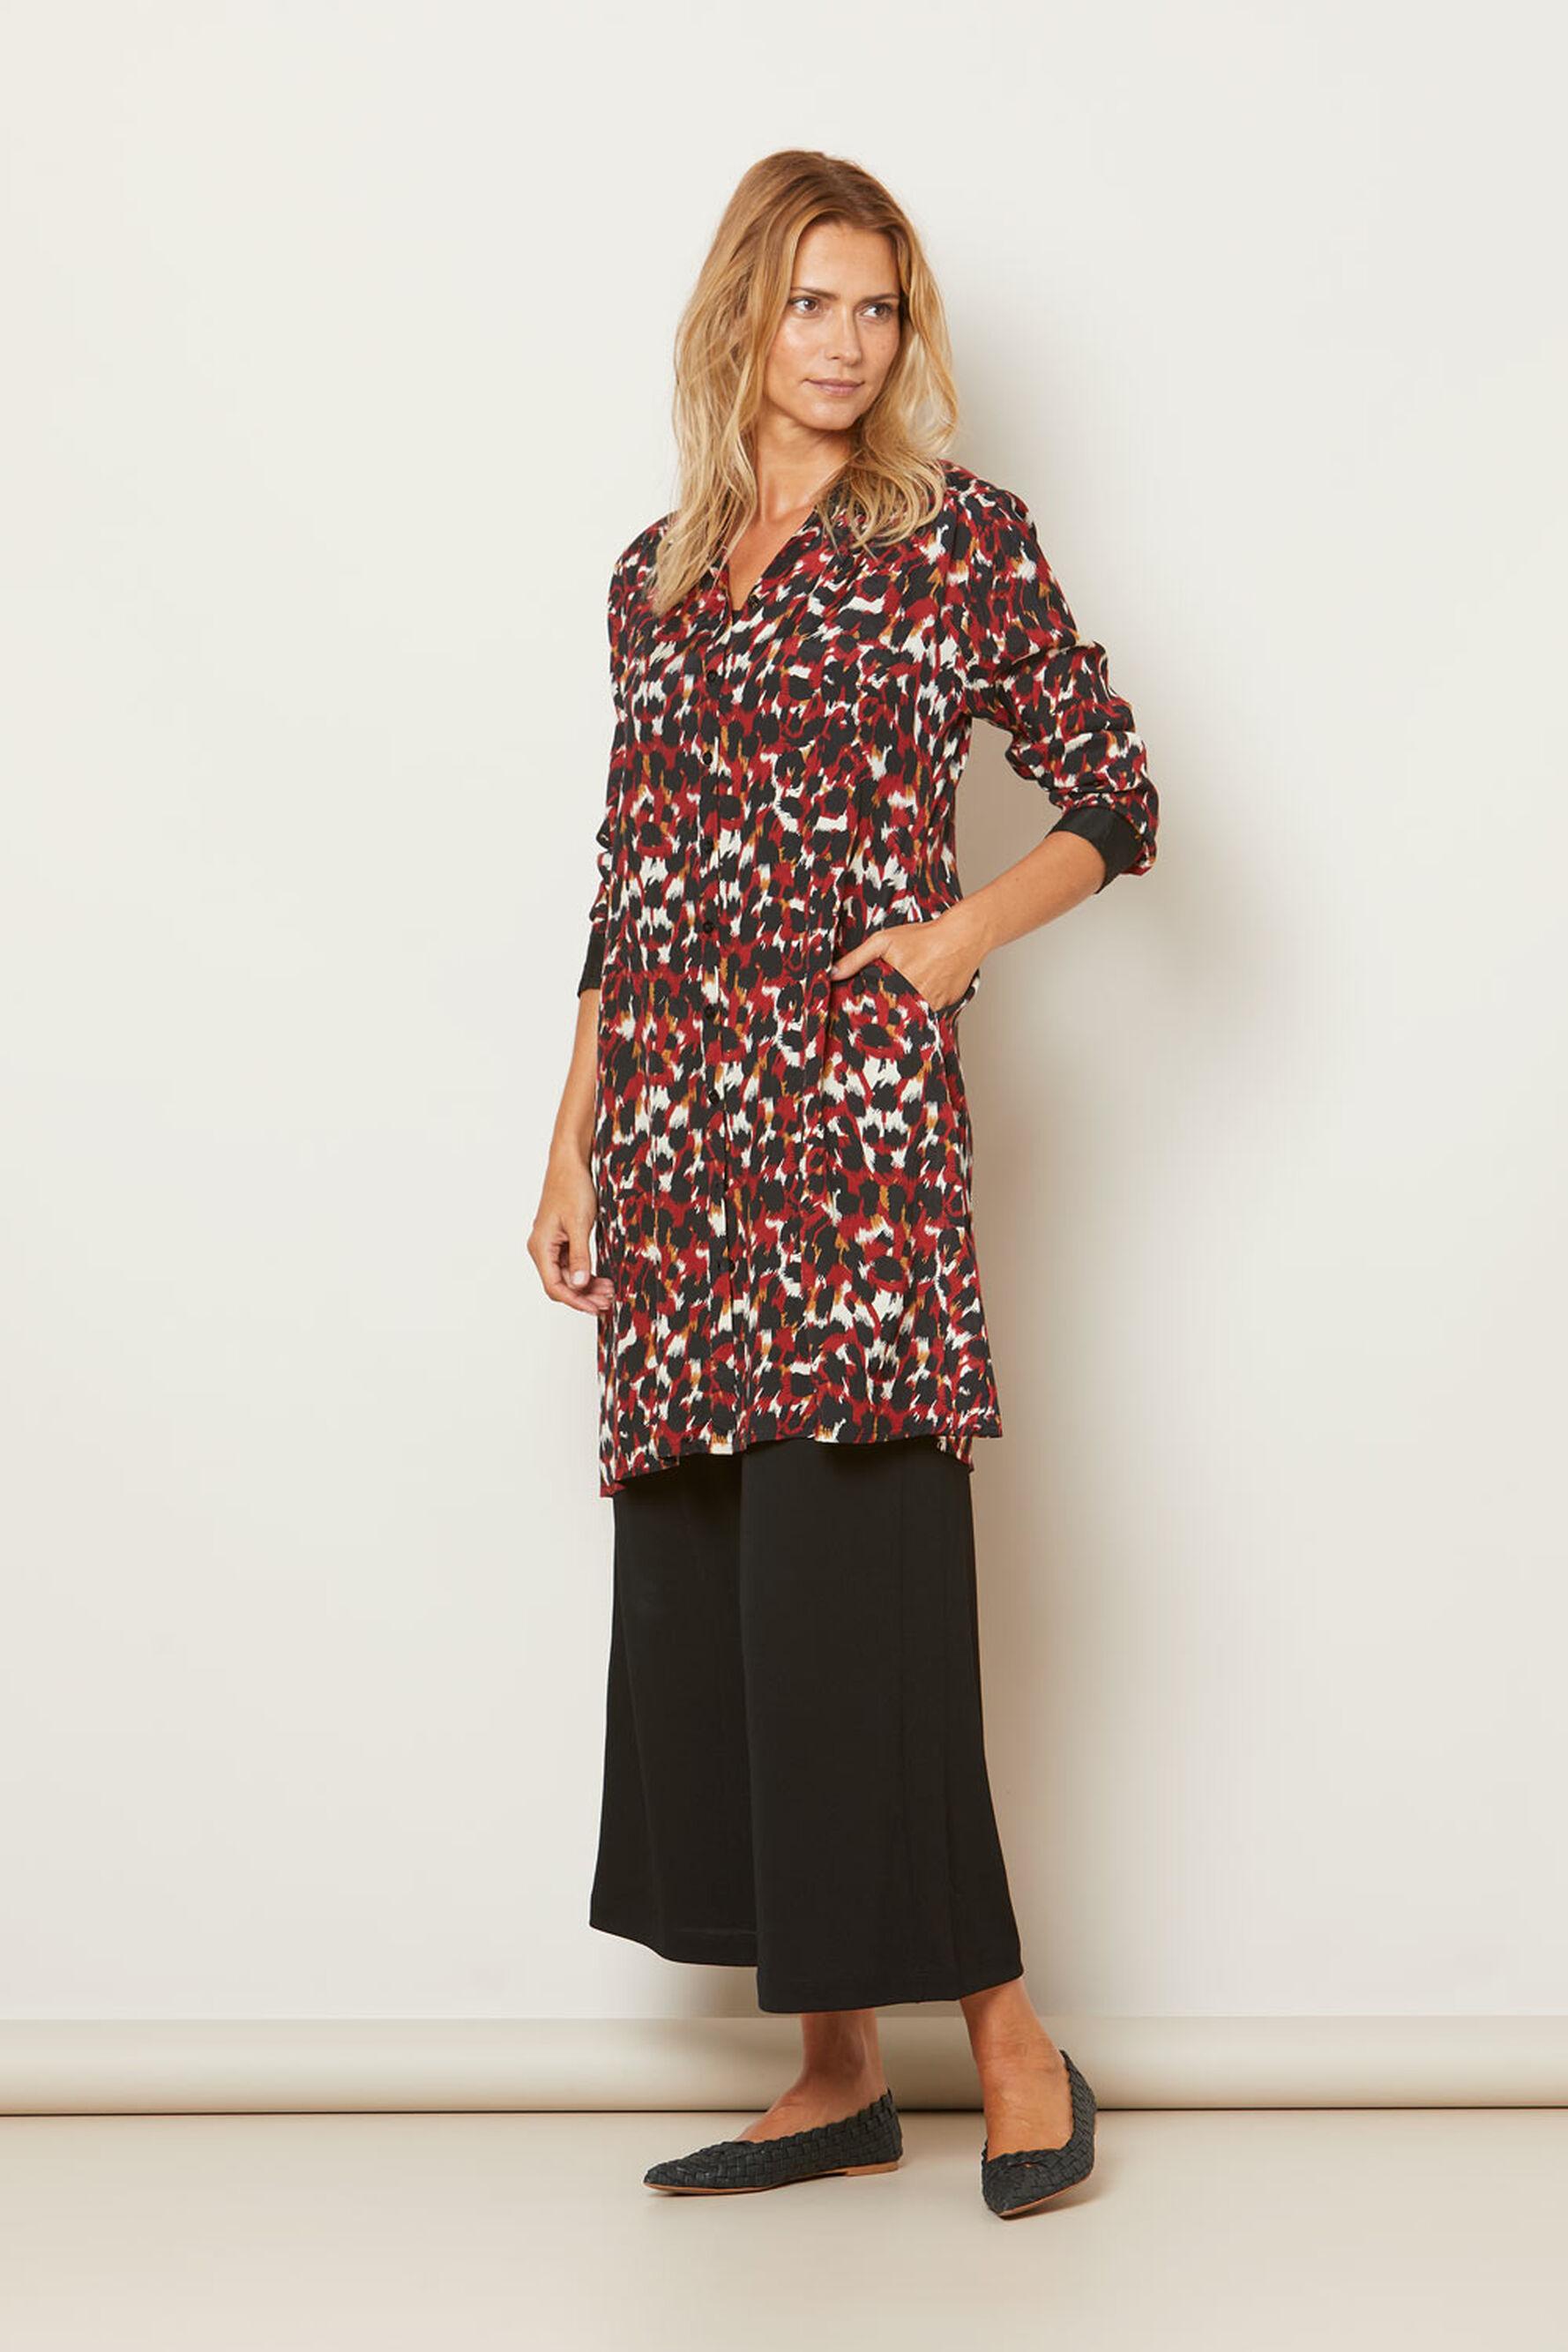 NININI SHIRT DRESS, RIO RED ORG, hi-res